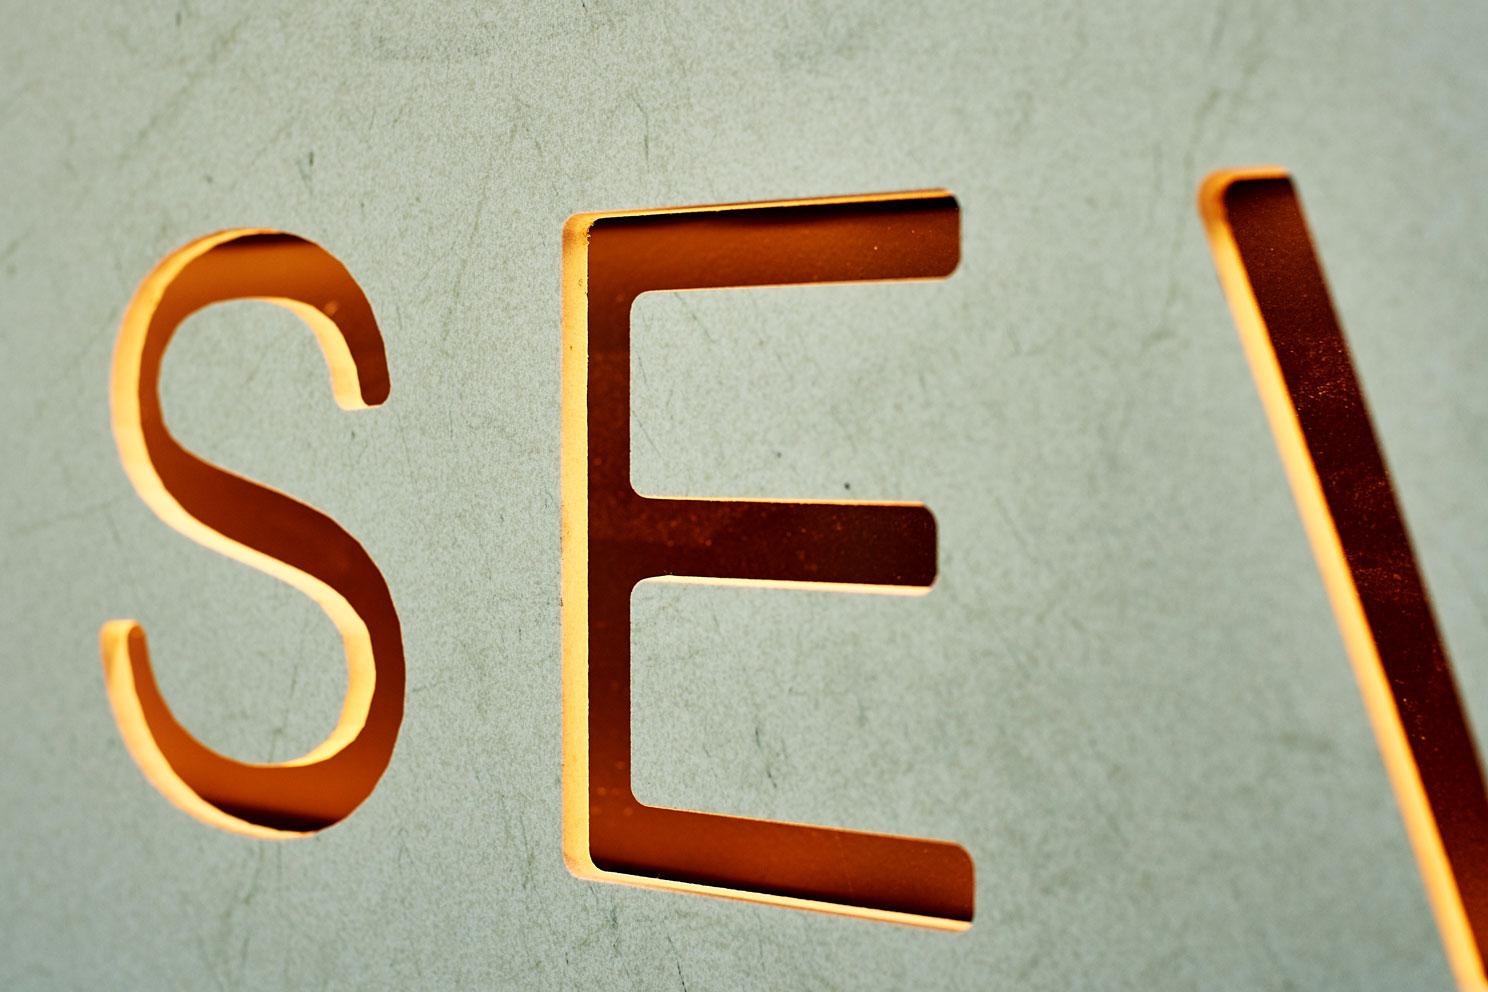 LD Sevilla  - cosentino 284 recurso letras DSC 0172 60